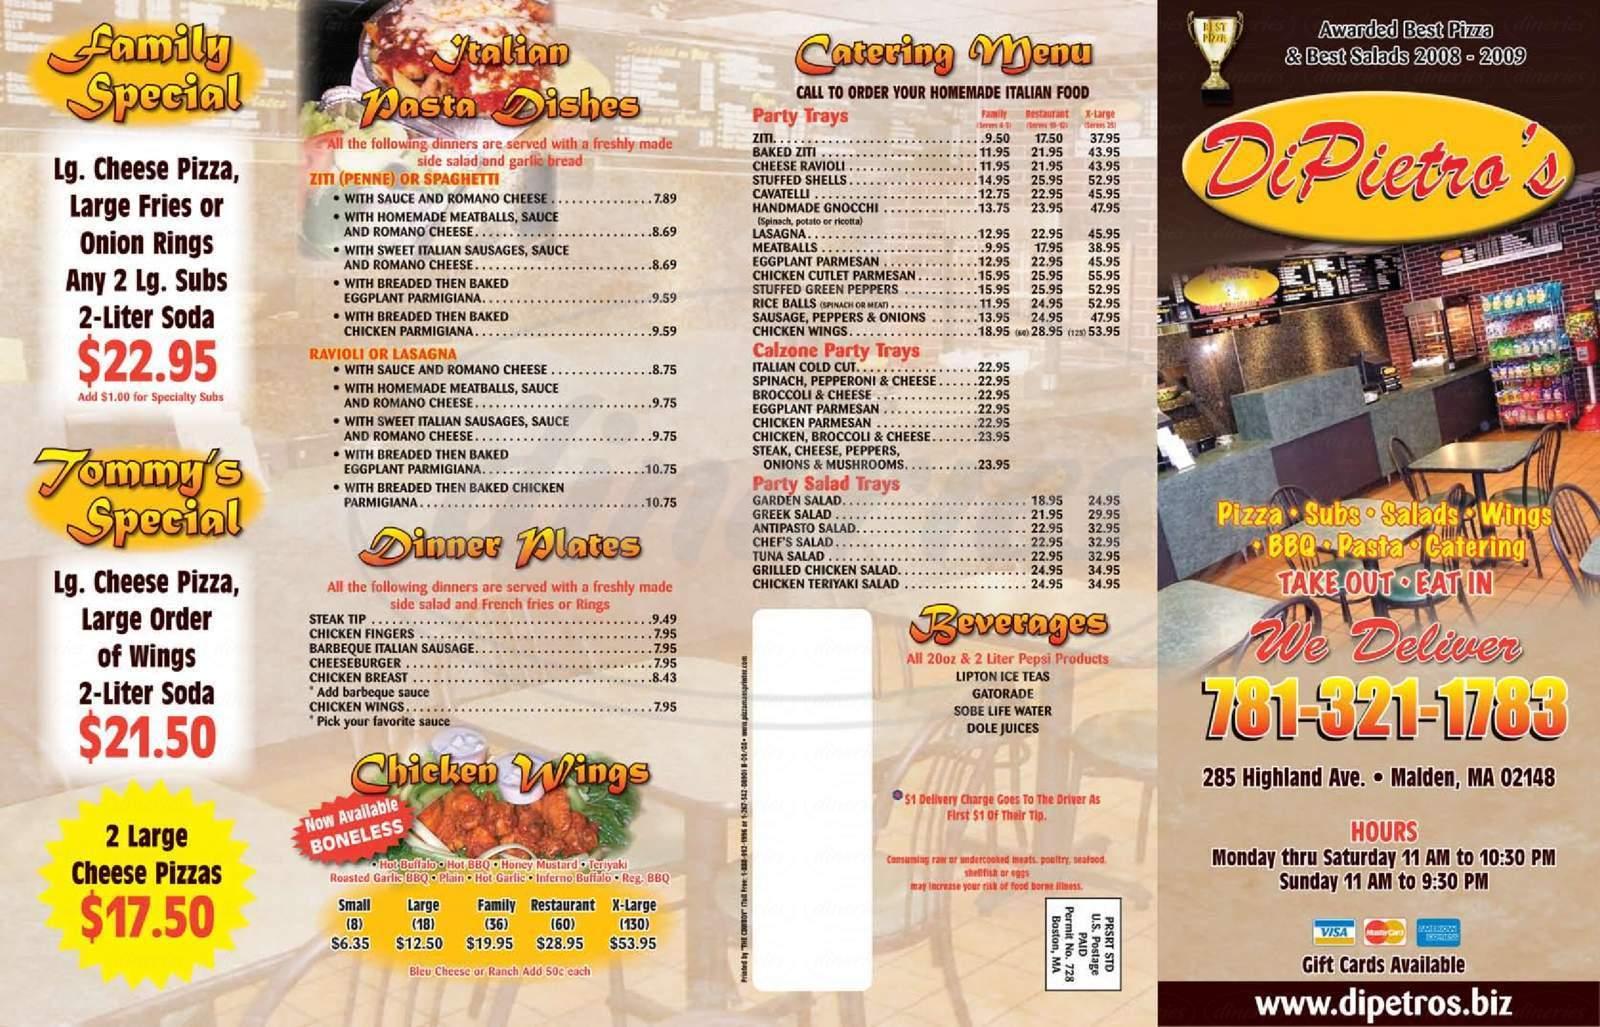 menu for DiPietro's Pizza